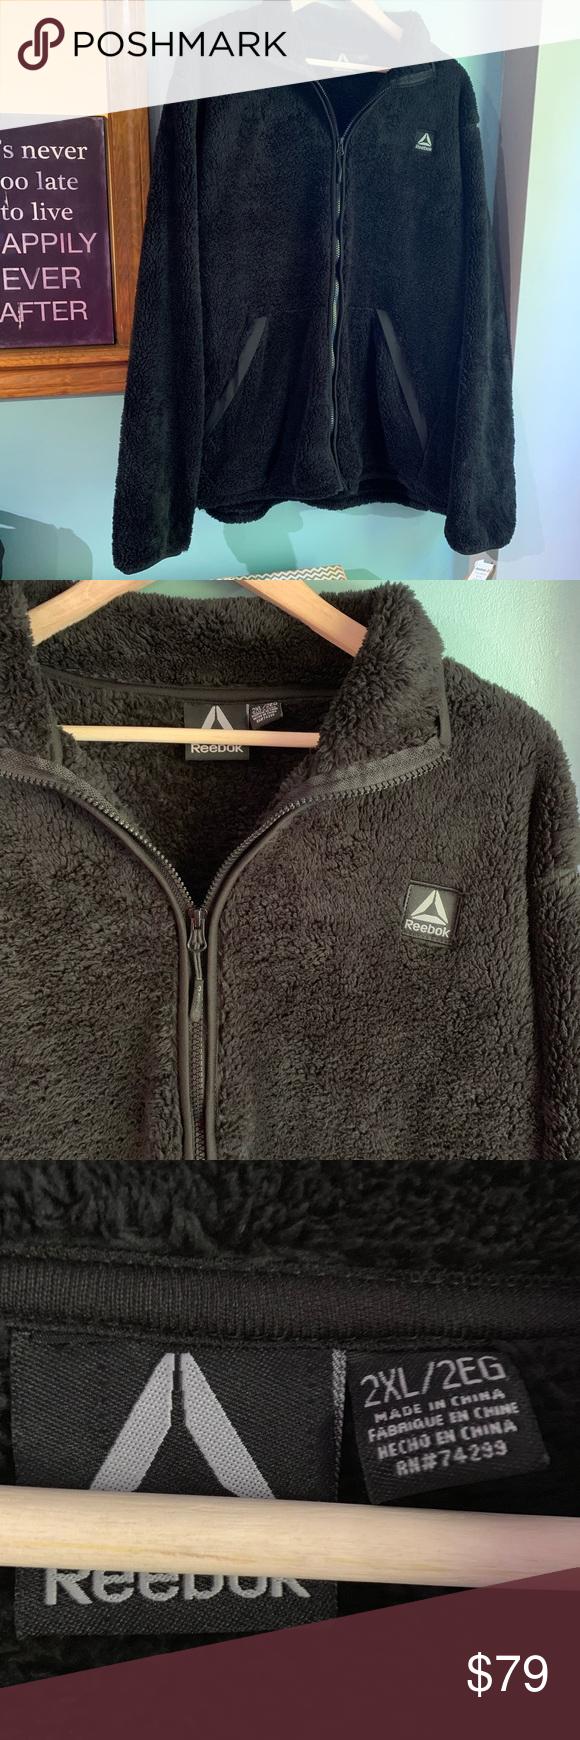 Reebok Fleece Jacket New With Tag S Full Zip Up Fuzzy Fleece Jacket Bundle With Other Items For Better Deals Reebok Ja Fleece Jacket Jackets New Reebok [ 1740 x 580 Pixel ]